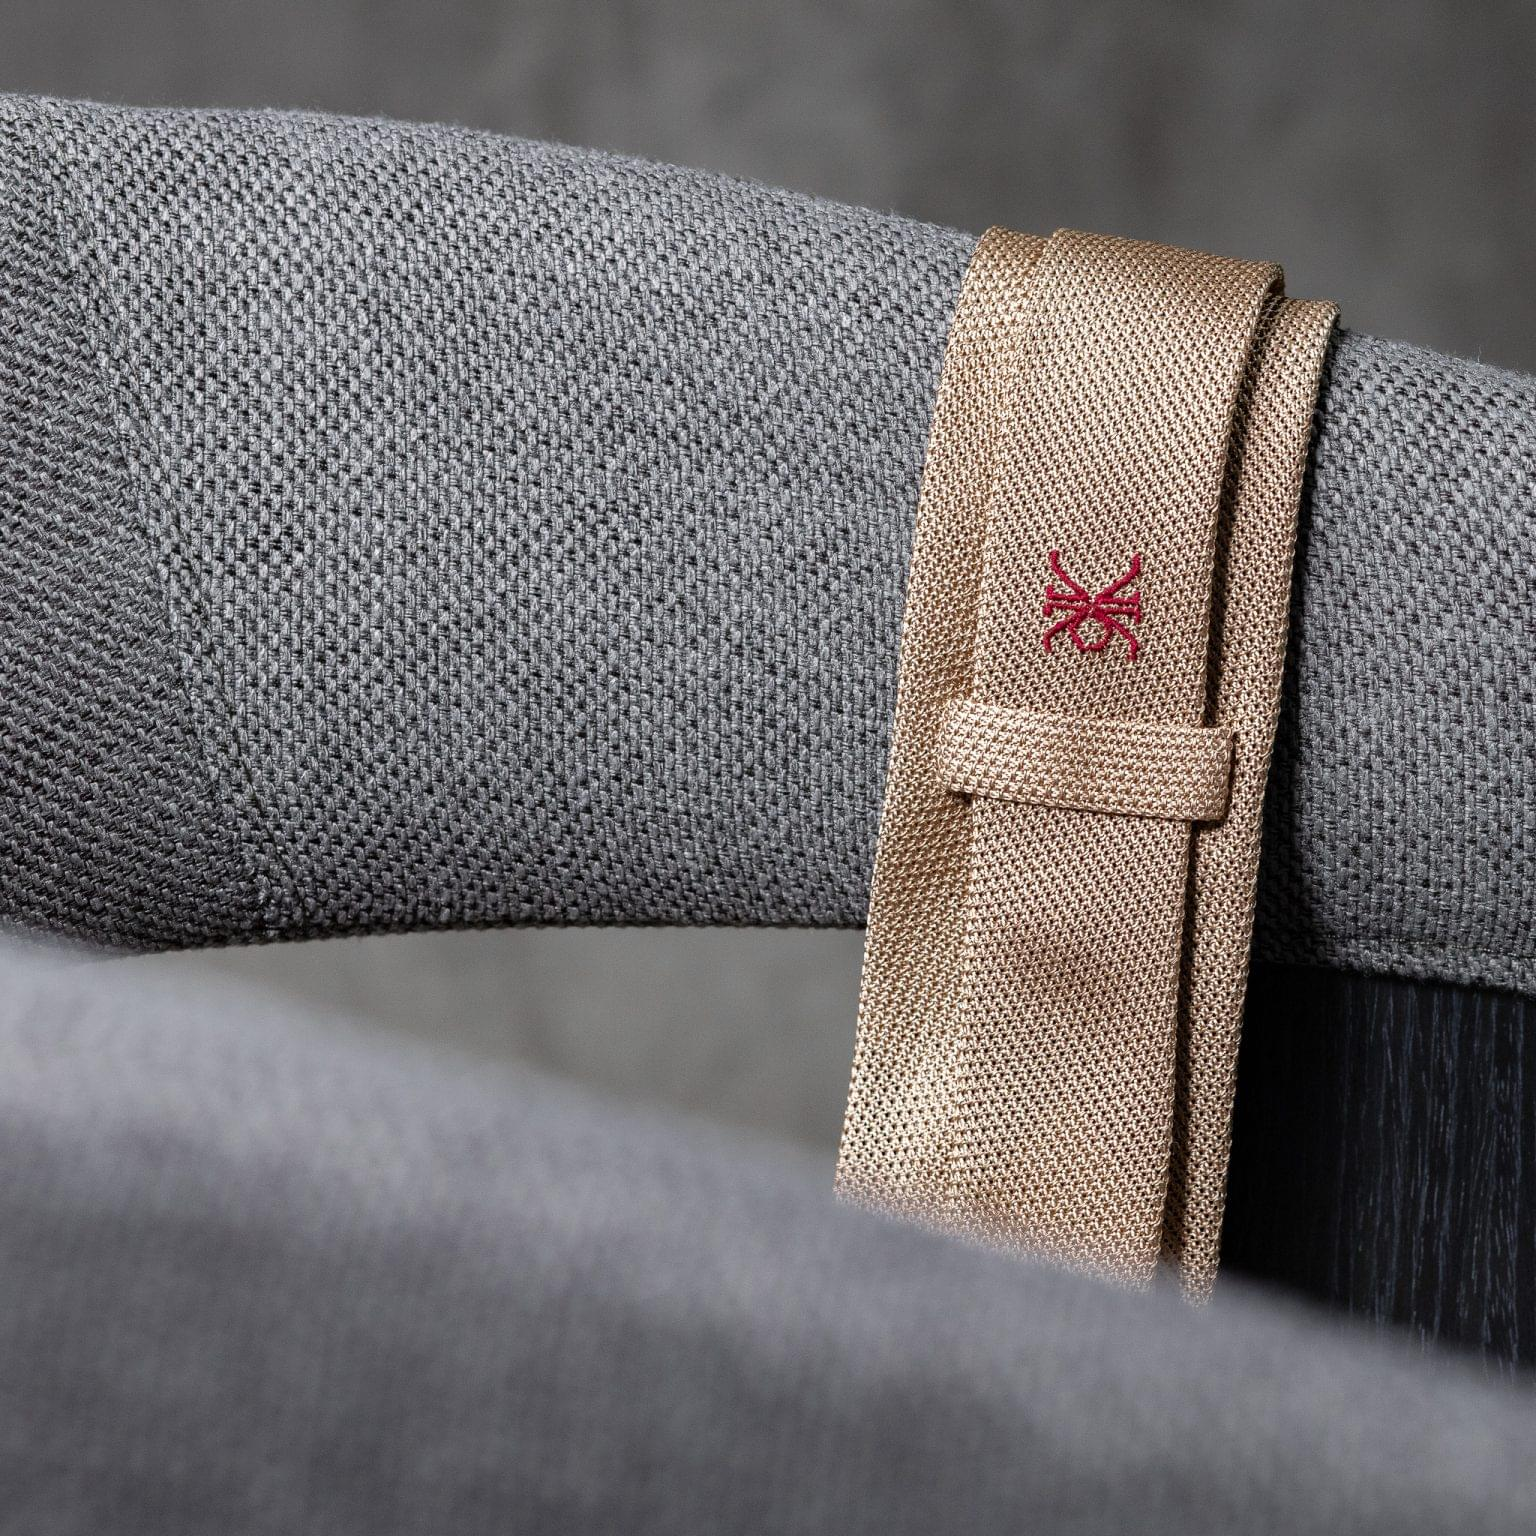 GRENADINE-0463-Tie-Initials-Corbata-Iniciales-The-Seelk-4